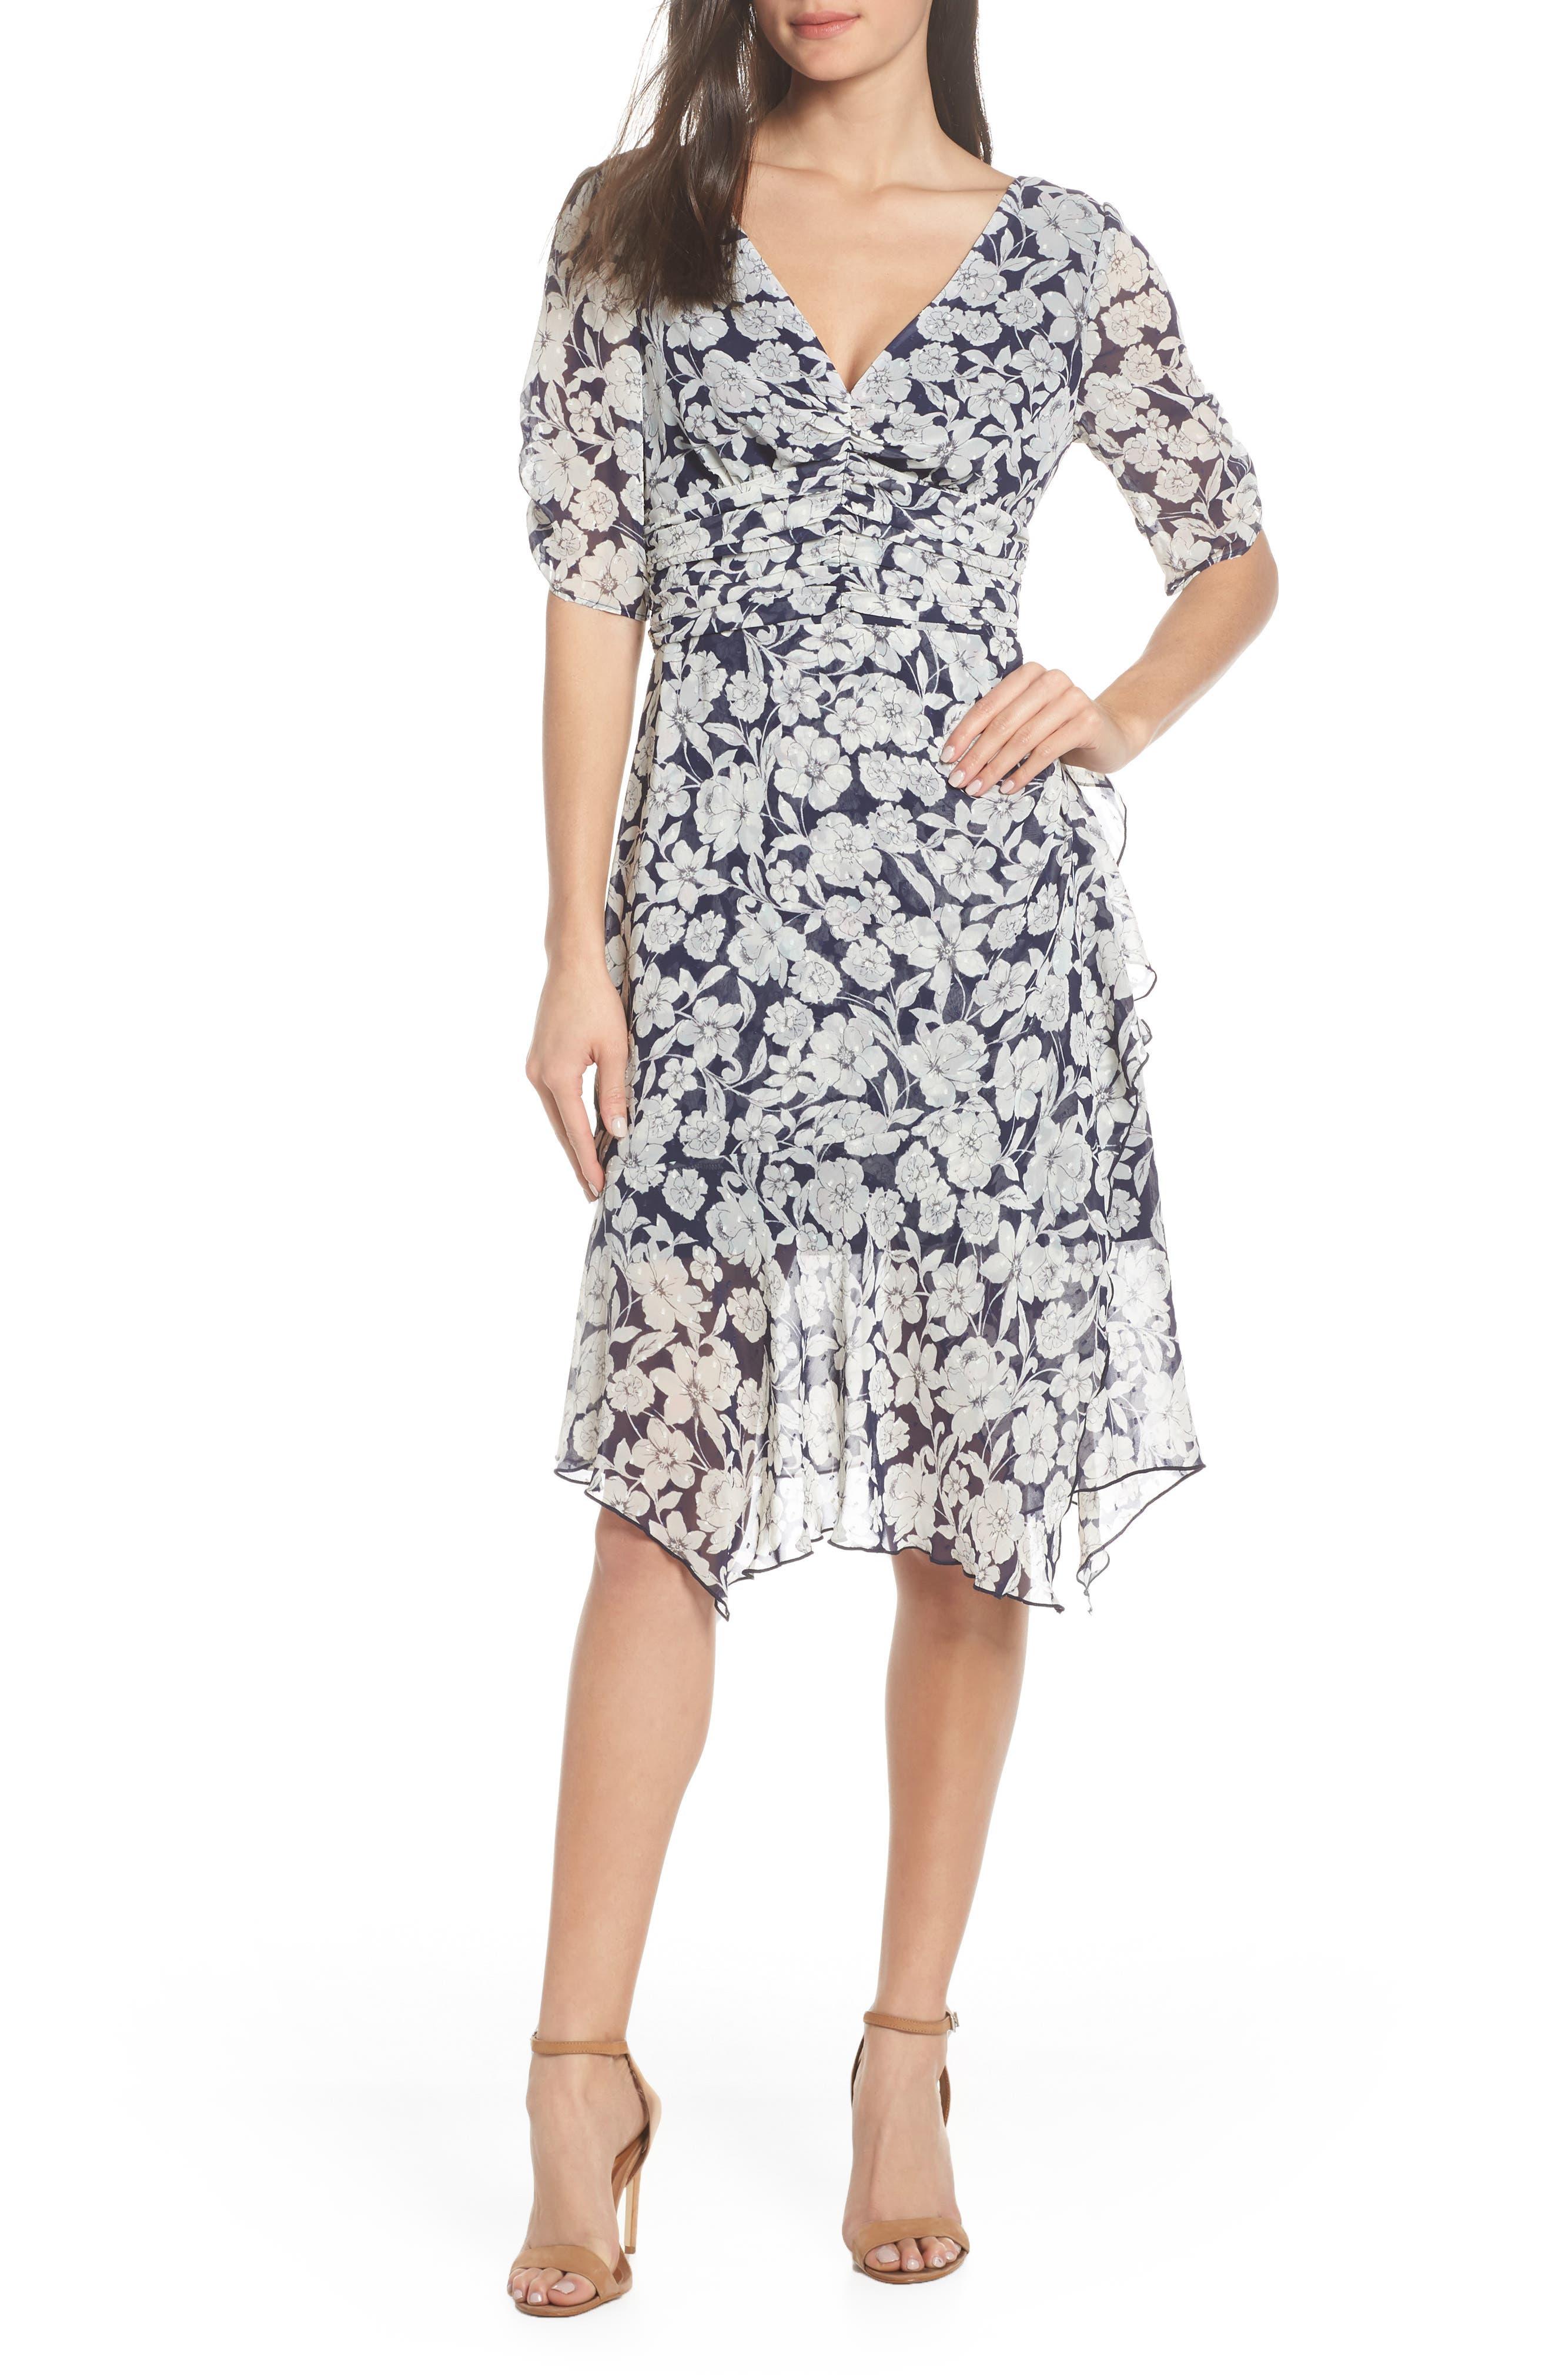 Petite Chelsea28 Floral Print Ruched Dress, Blue